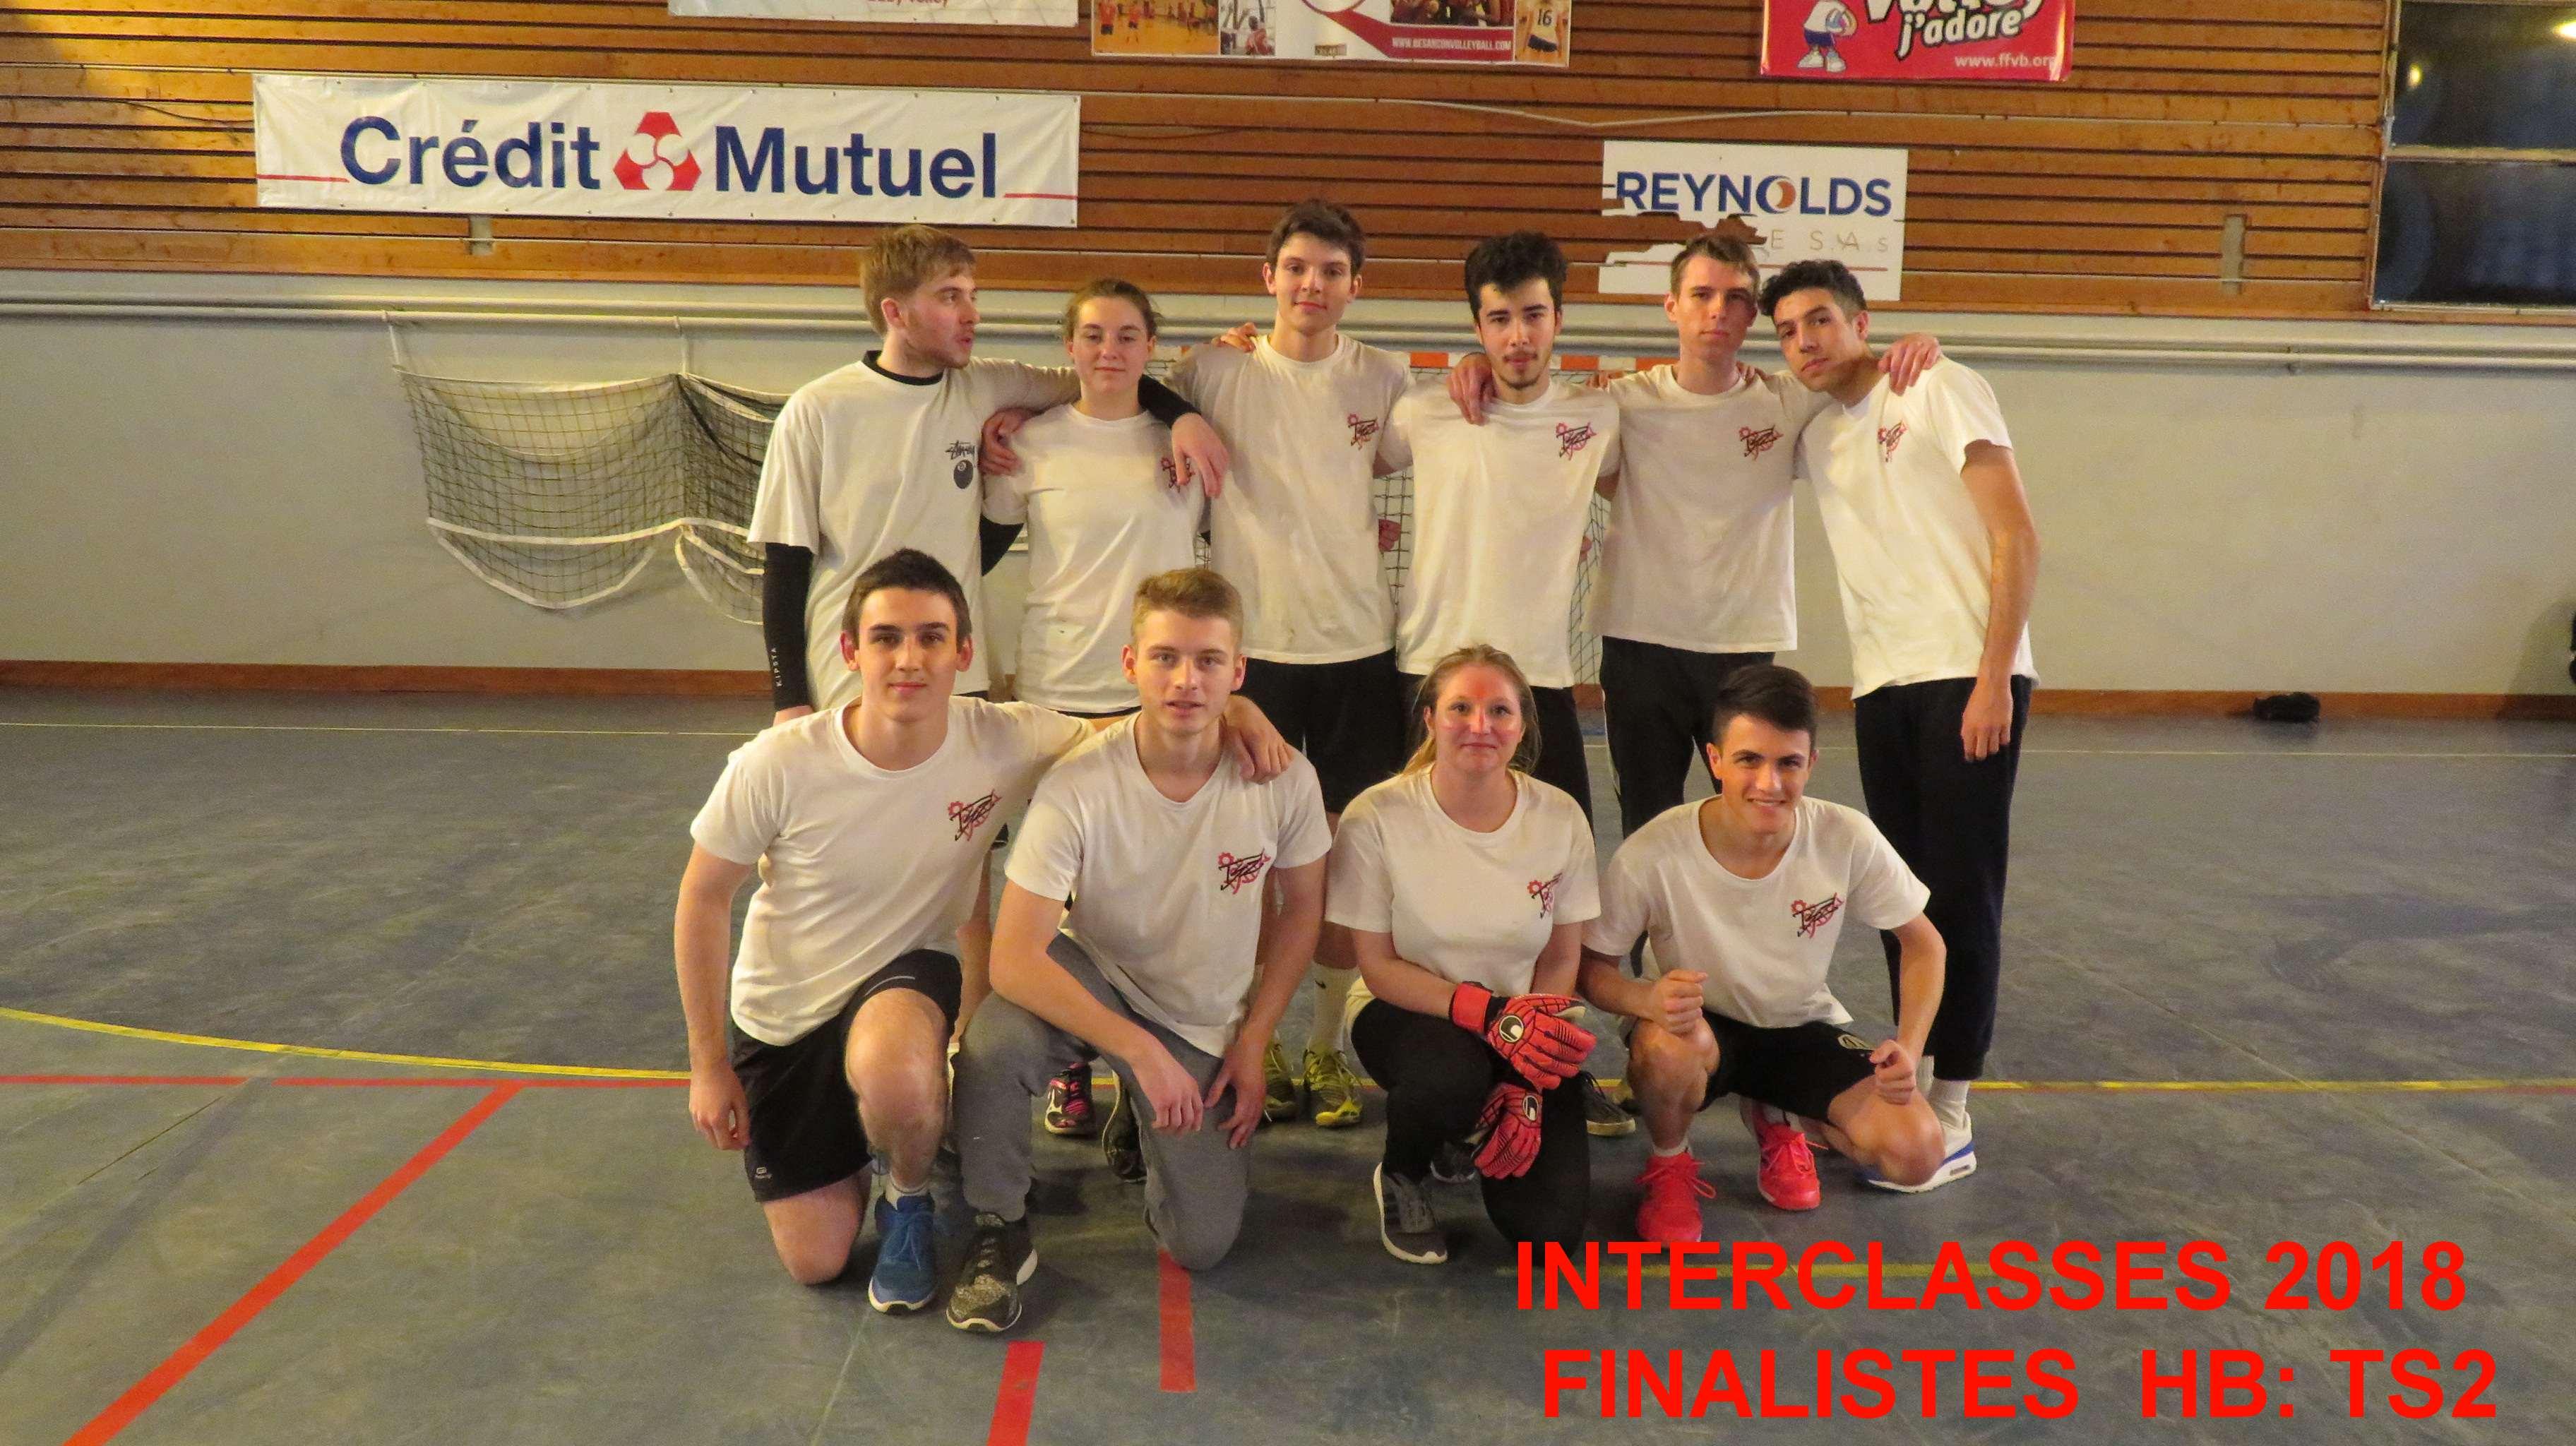 Finalistes HB TS2